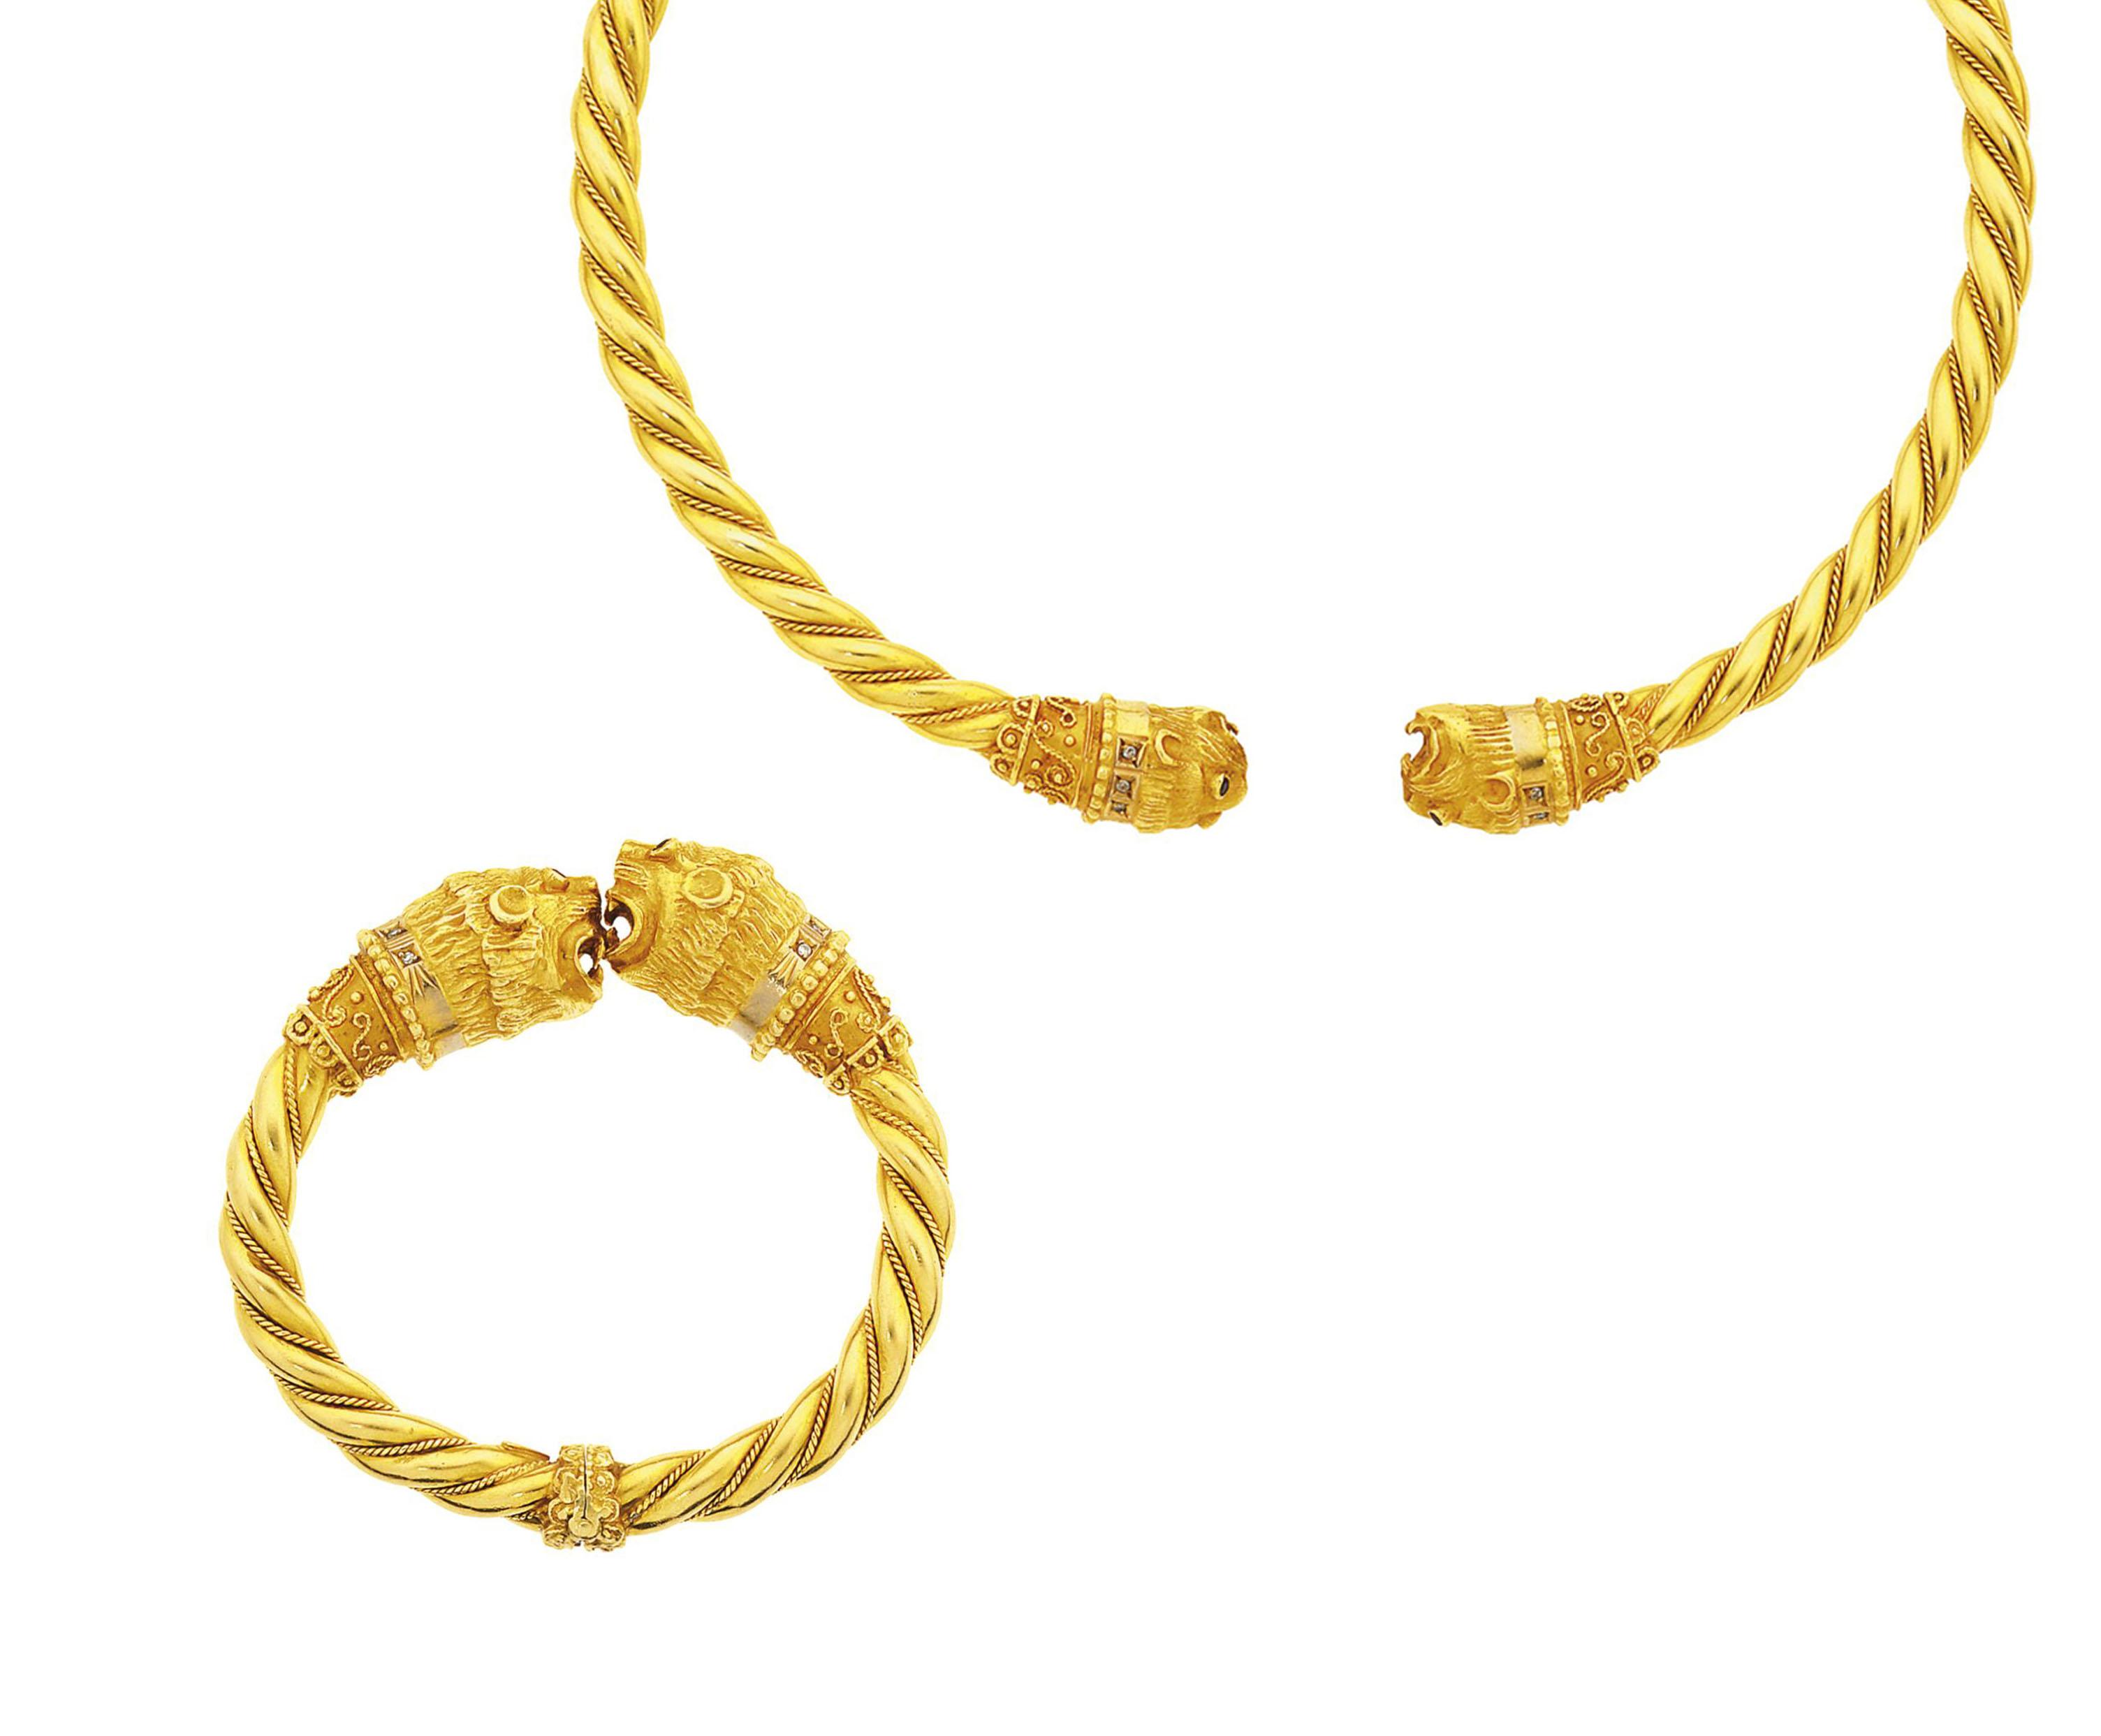 A gem-set torc necklace and bangle